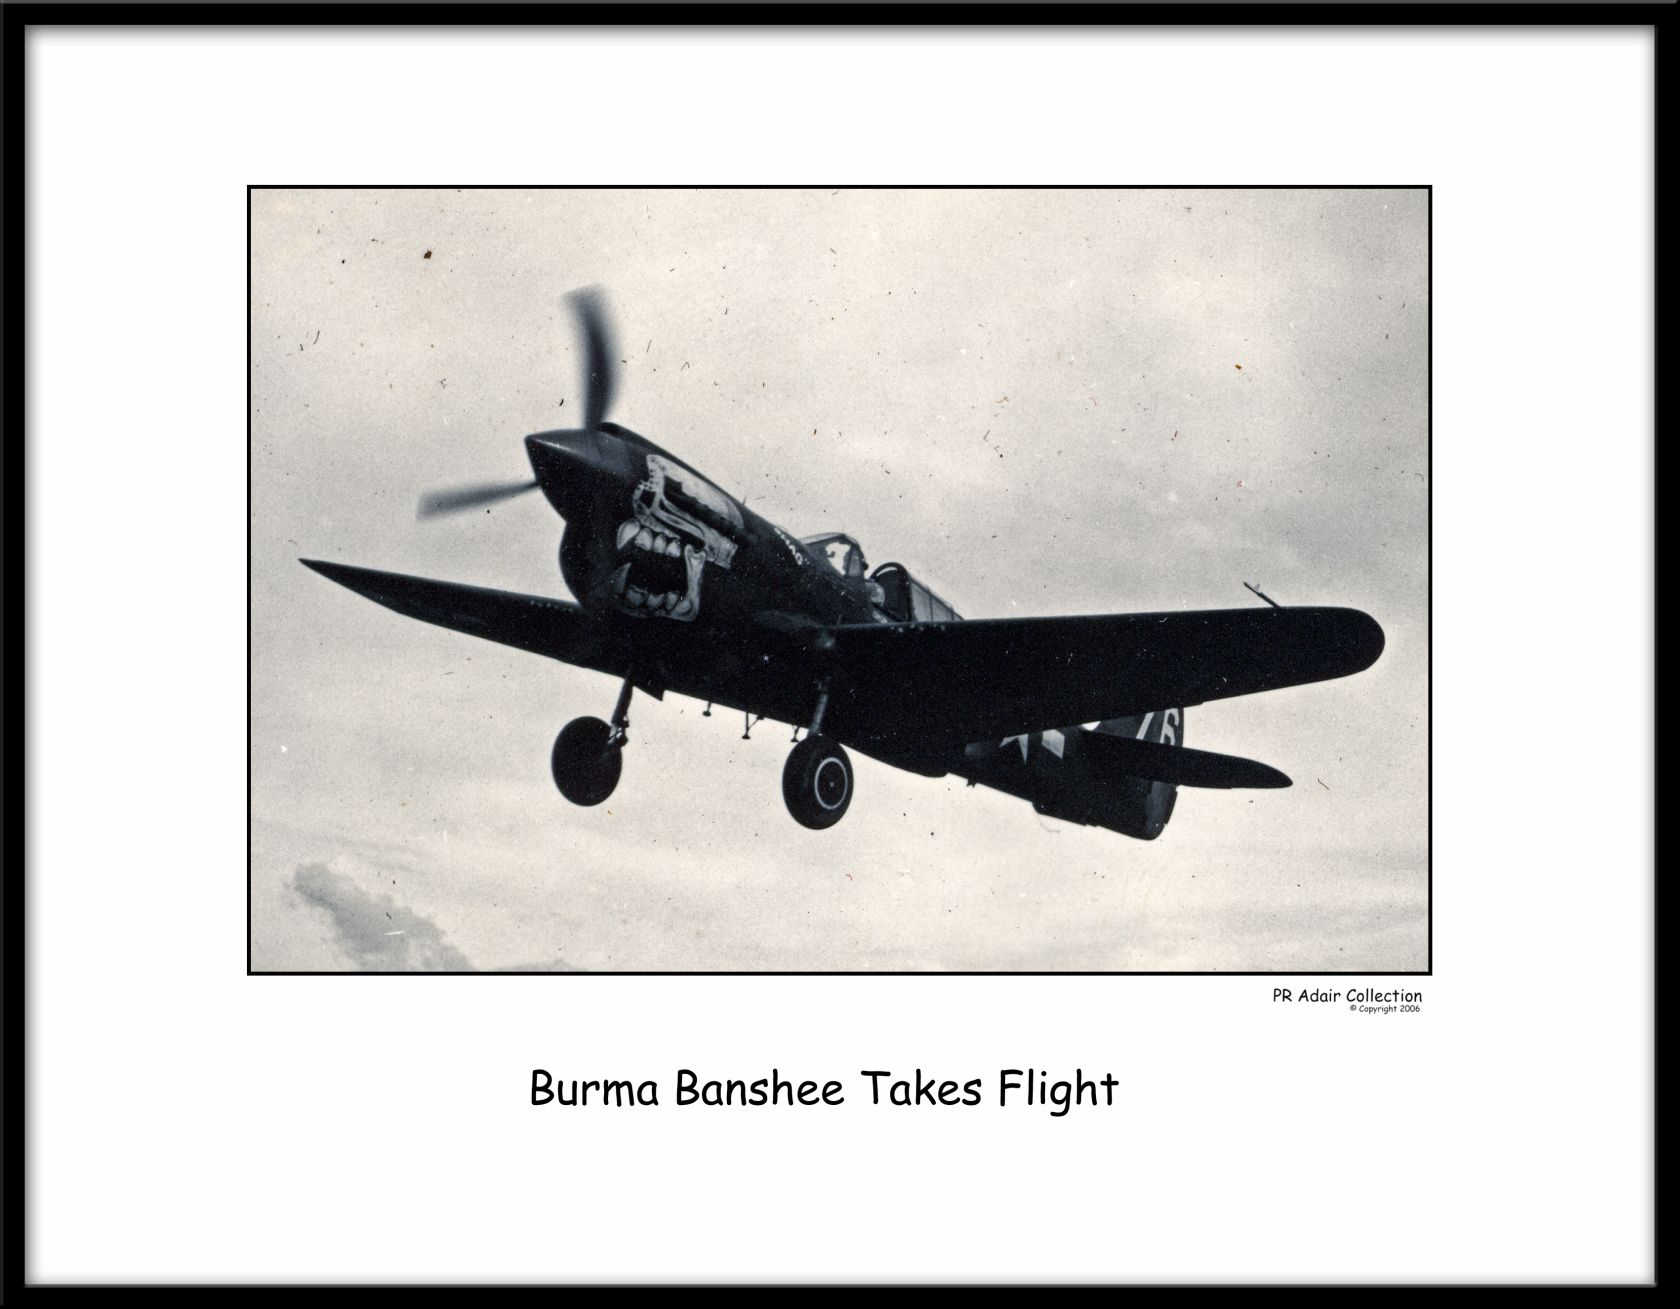 Burma Banshee 153